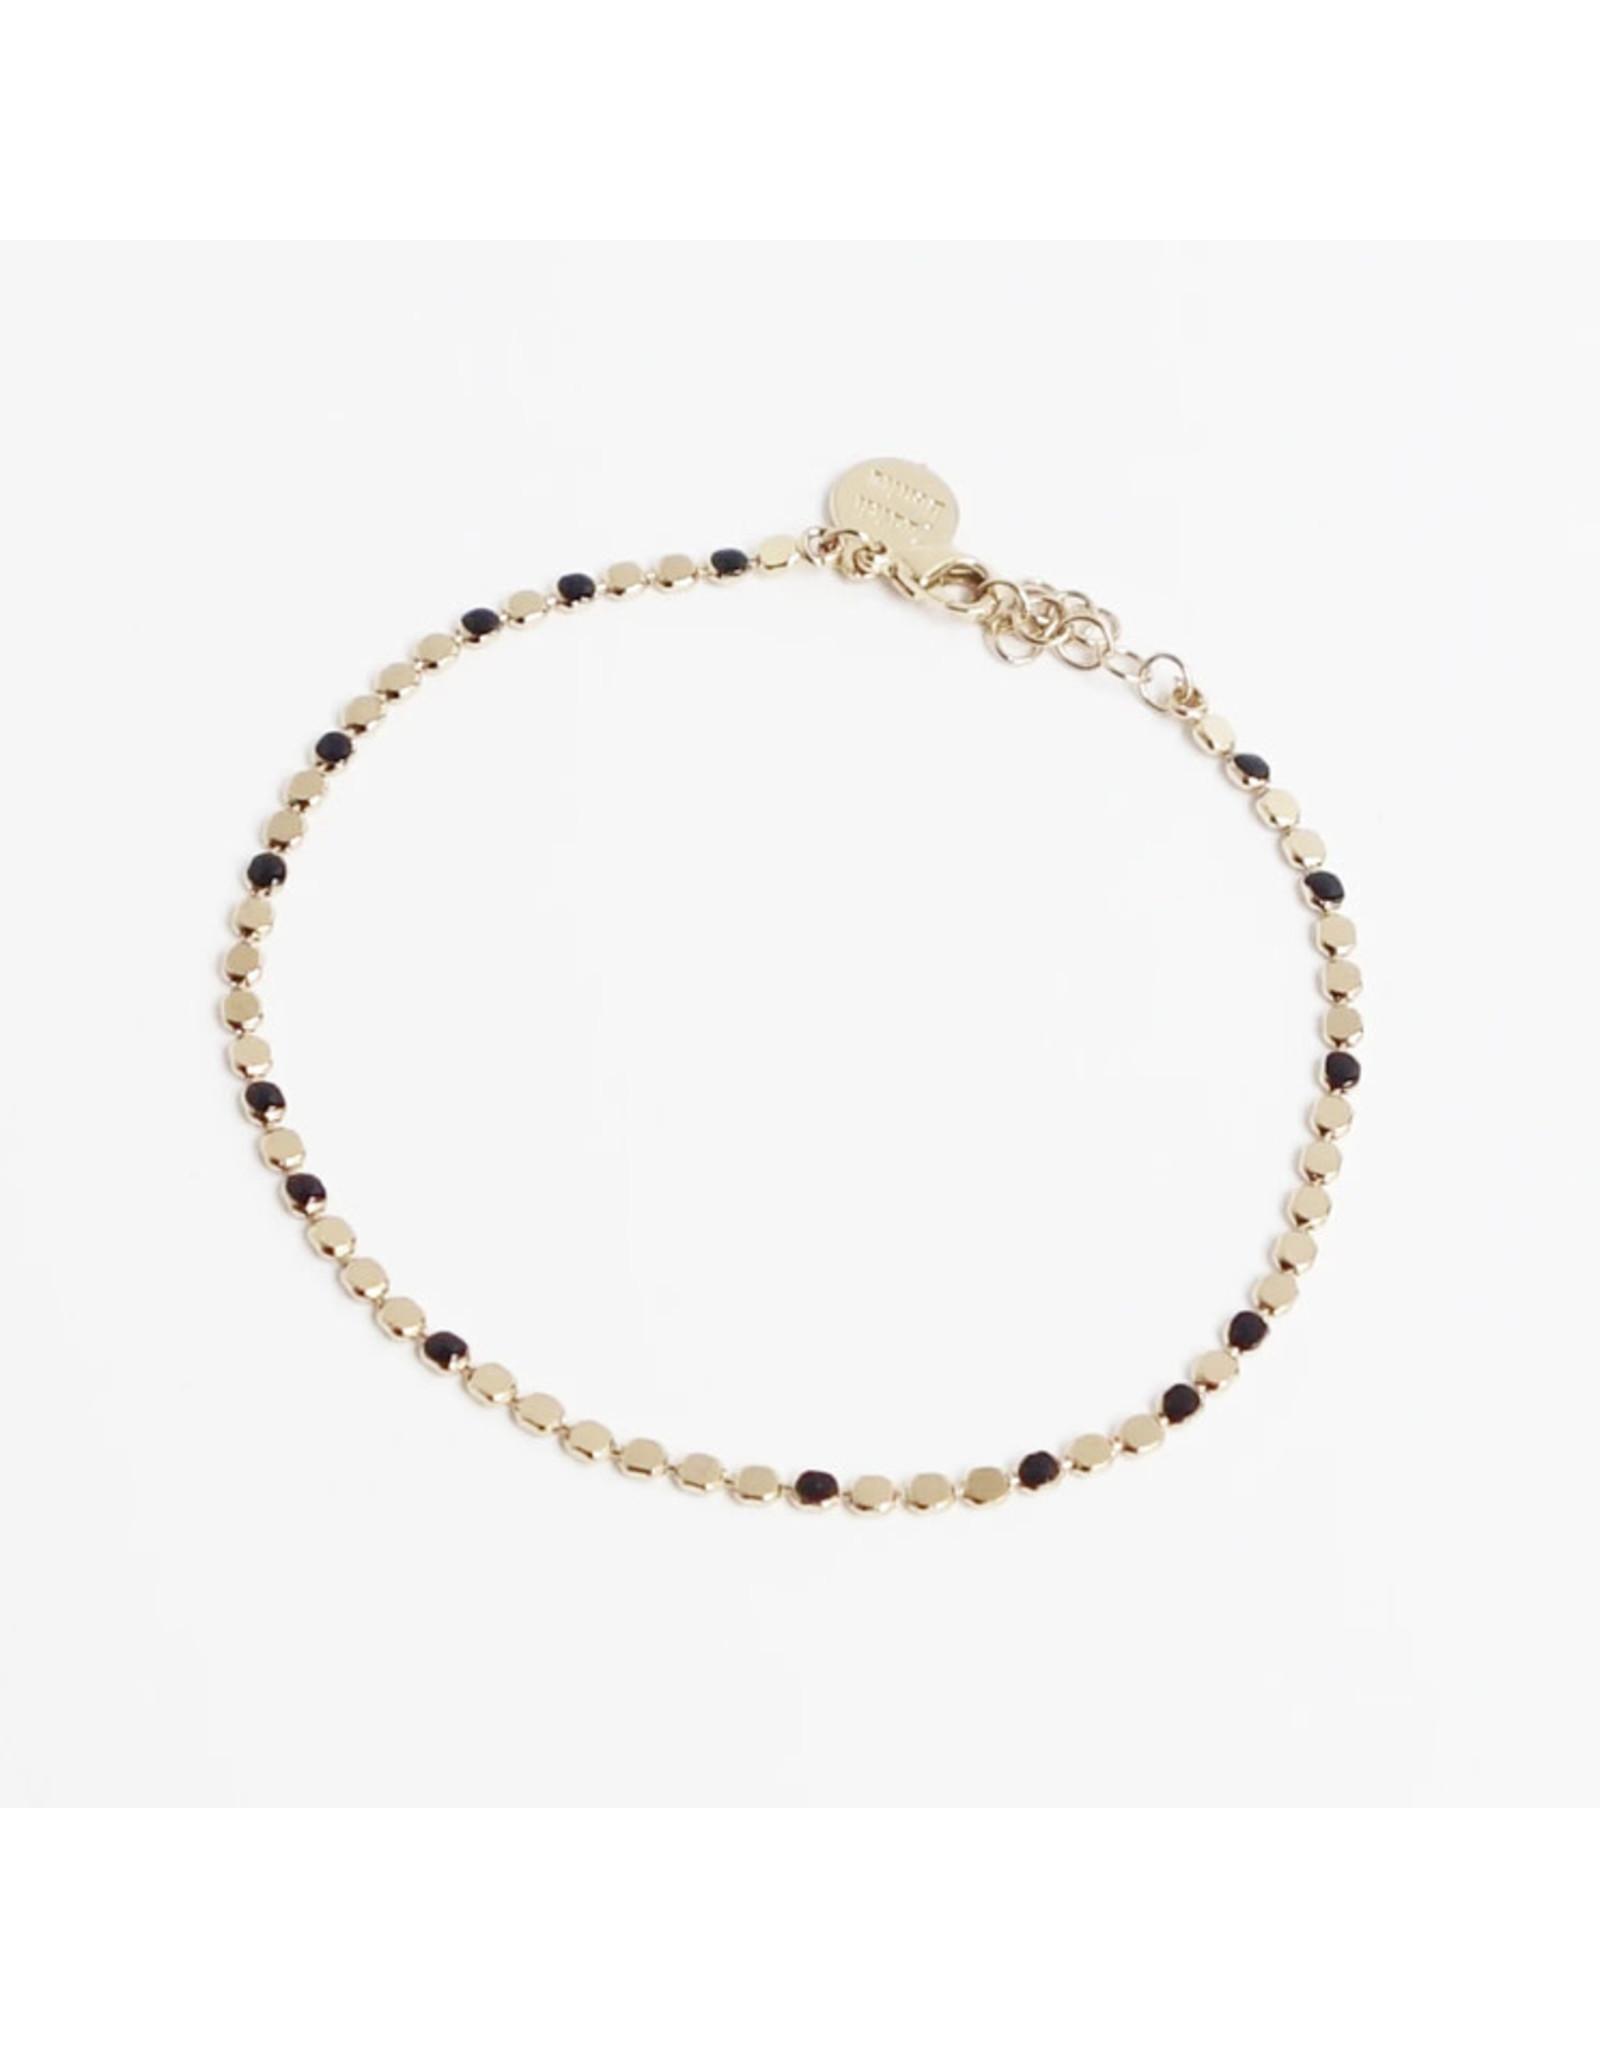 Judith Benita Armband Molto Simple - Zwart - Messing Verguld - Lengte 15,5cm